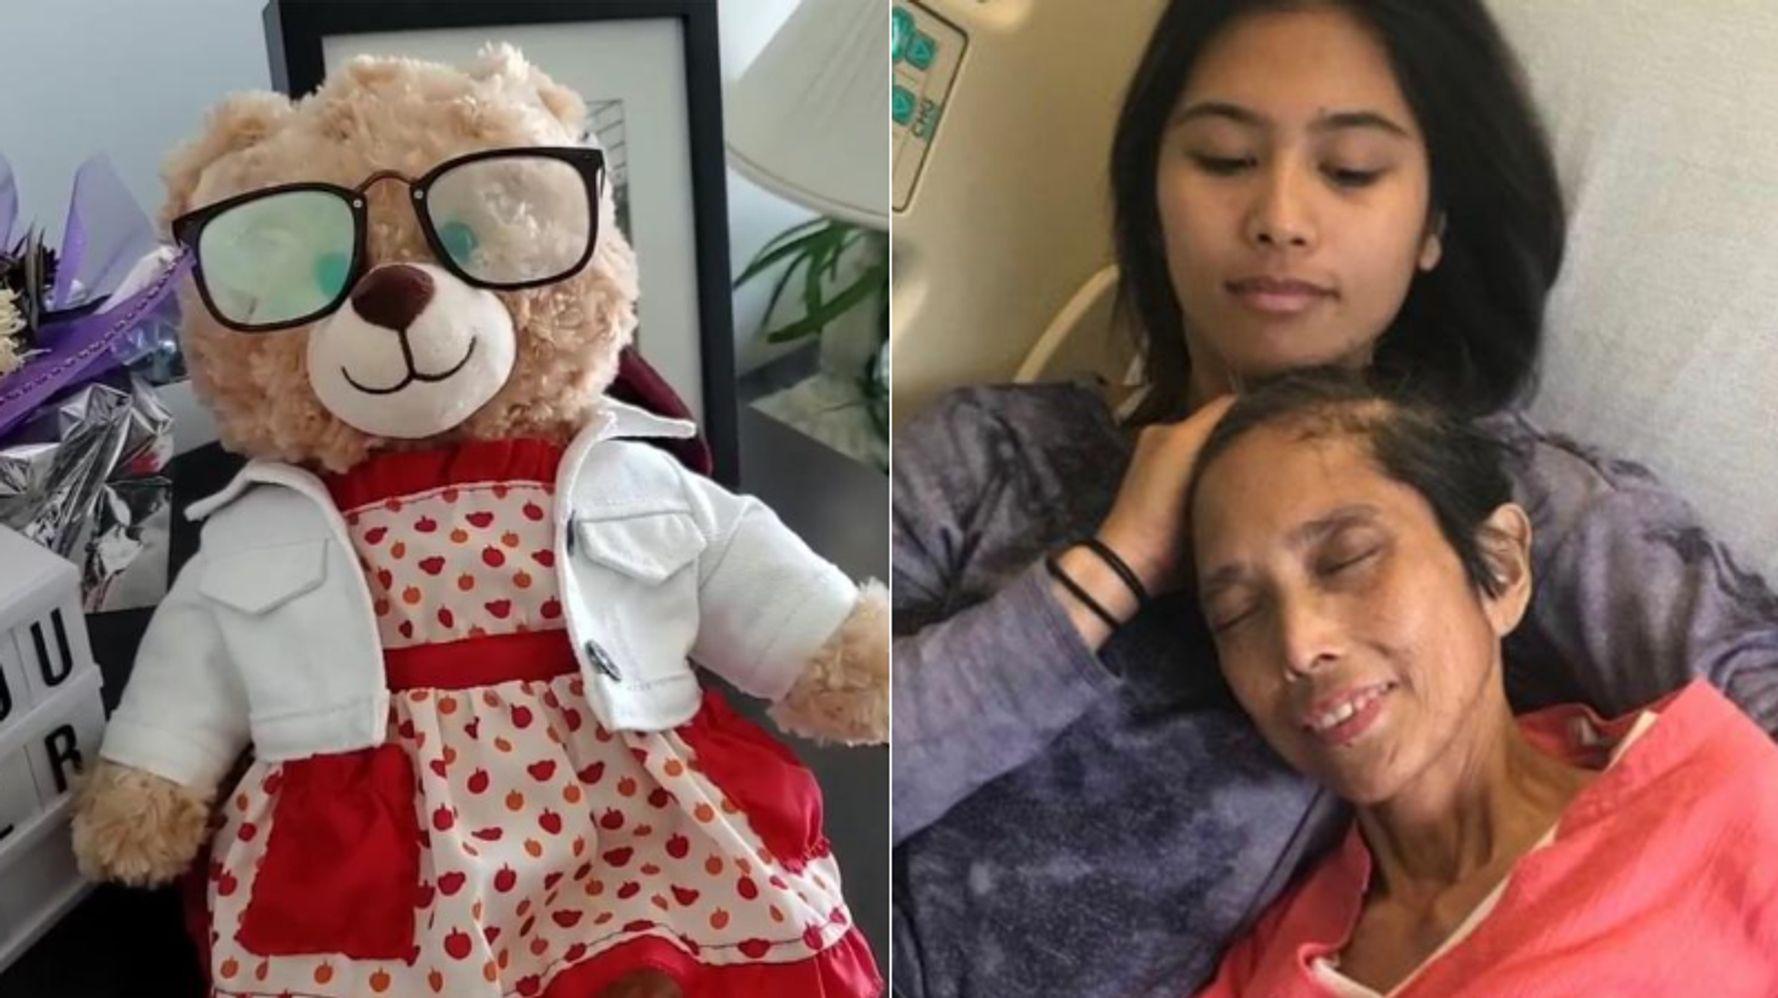 Celebrities Rally To Help Find Woman's Irreplaceable Stolen Teddy Bear